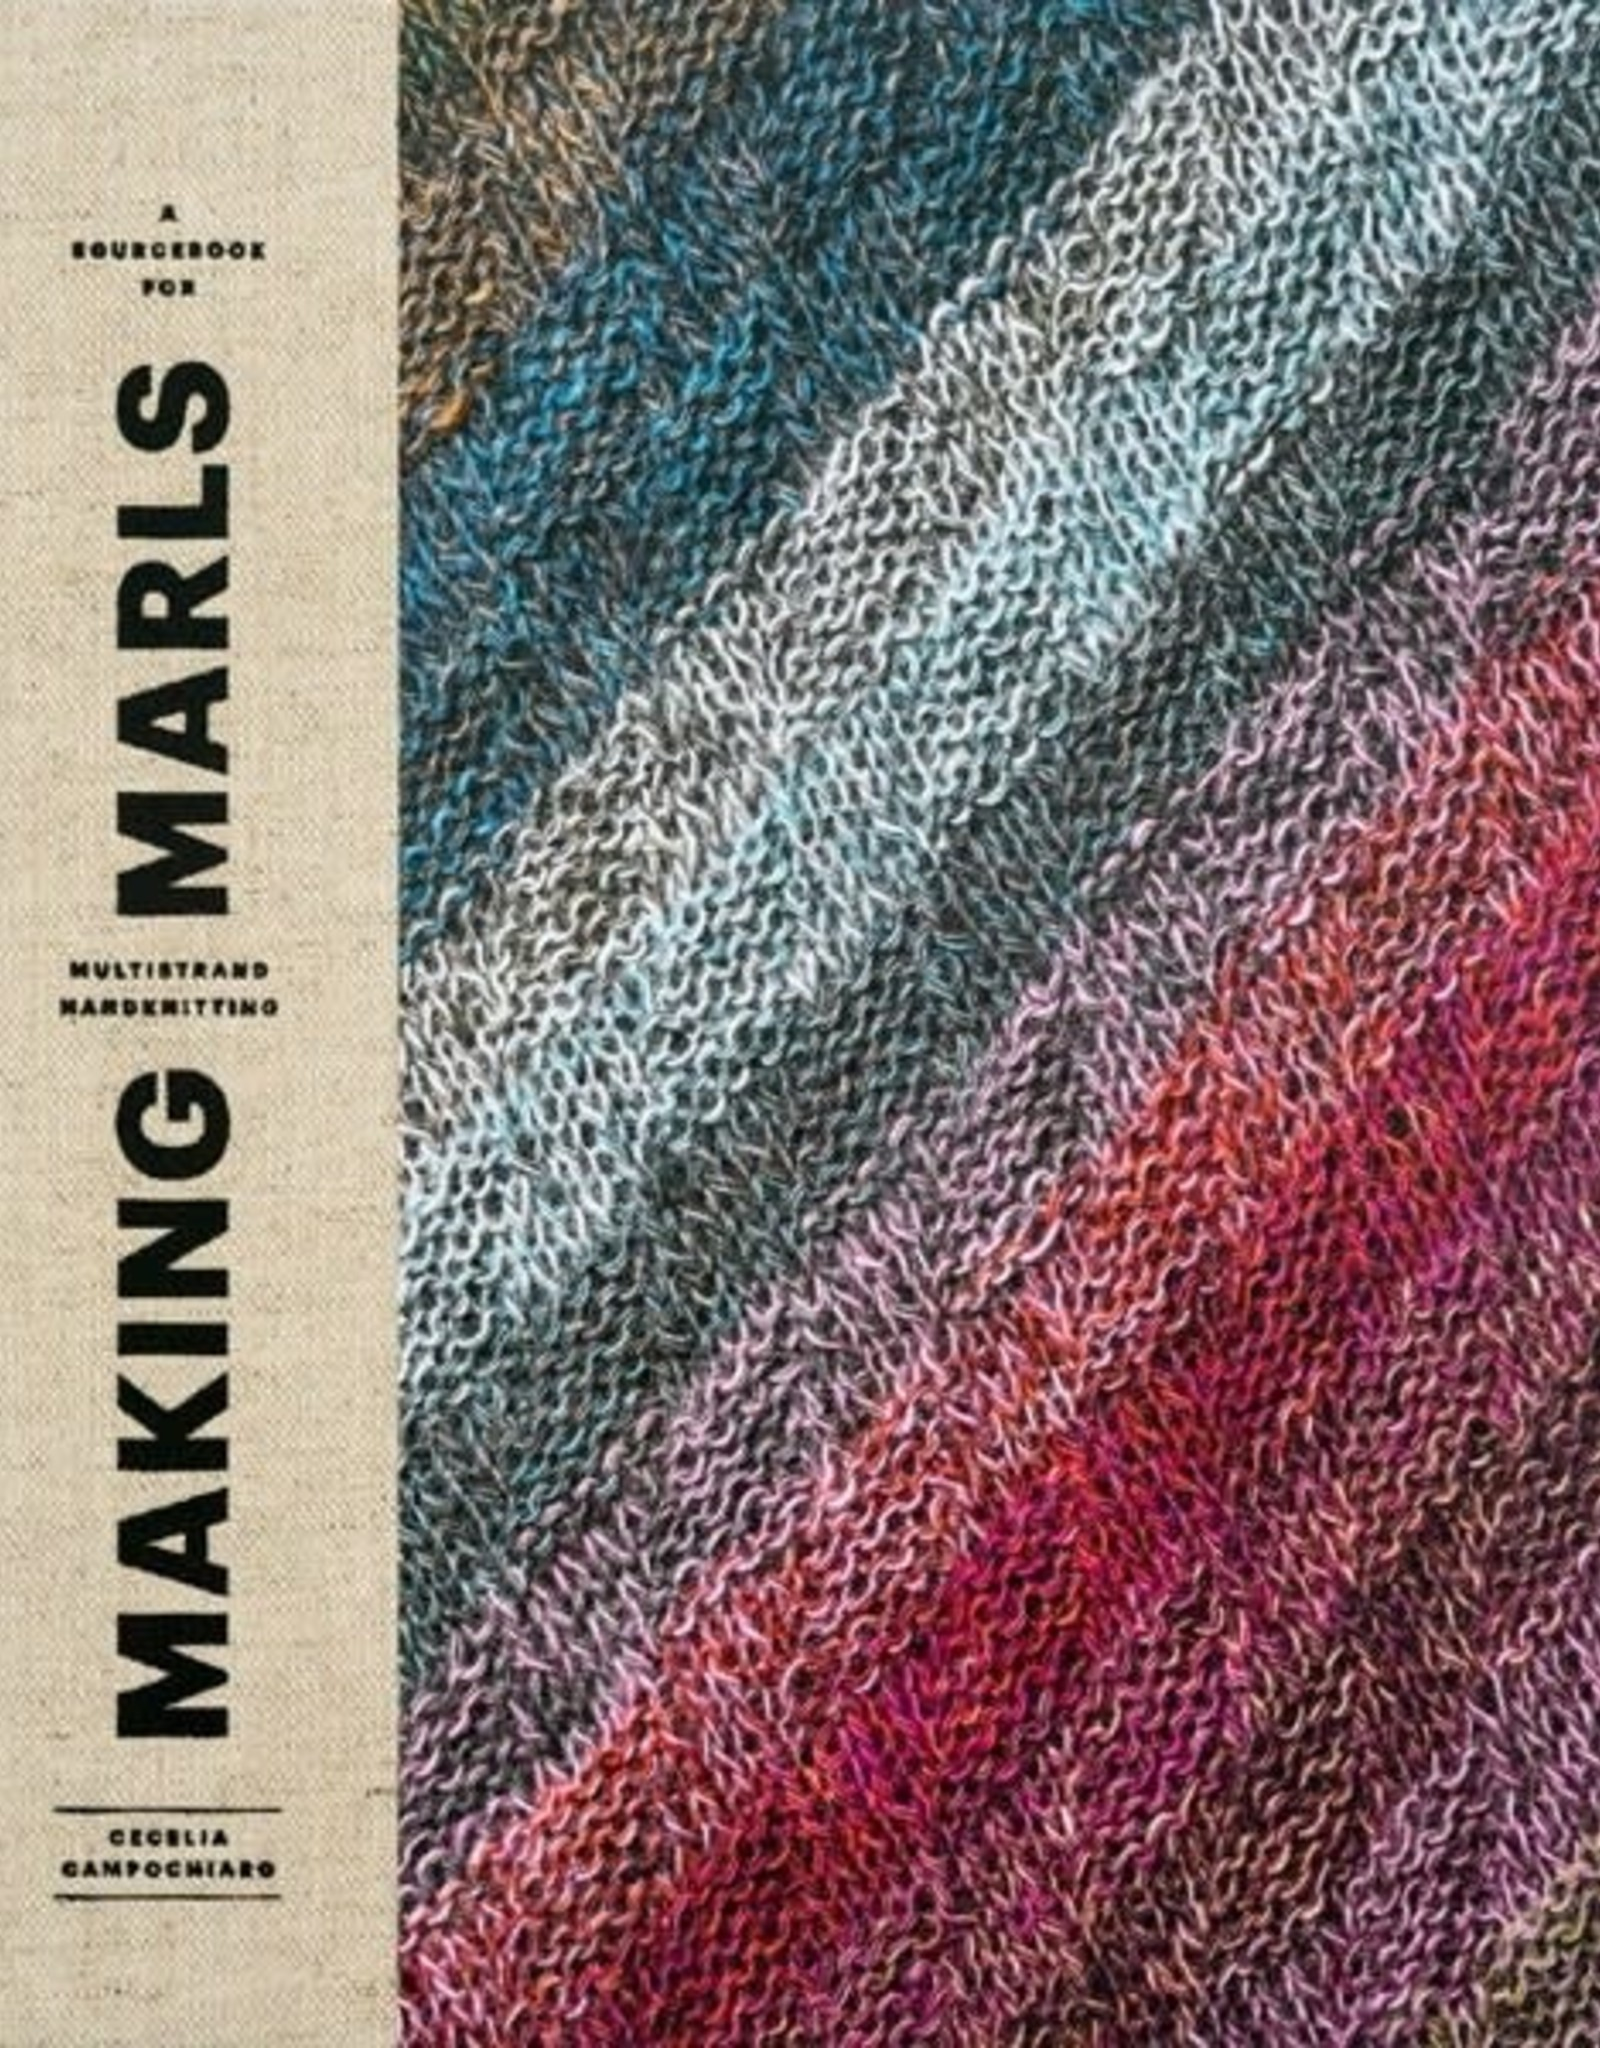 Book - Making Marls by Cecelia Campochiaro